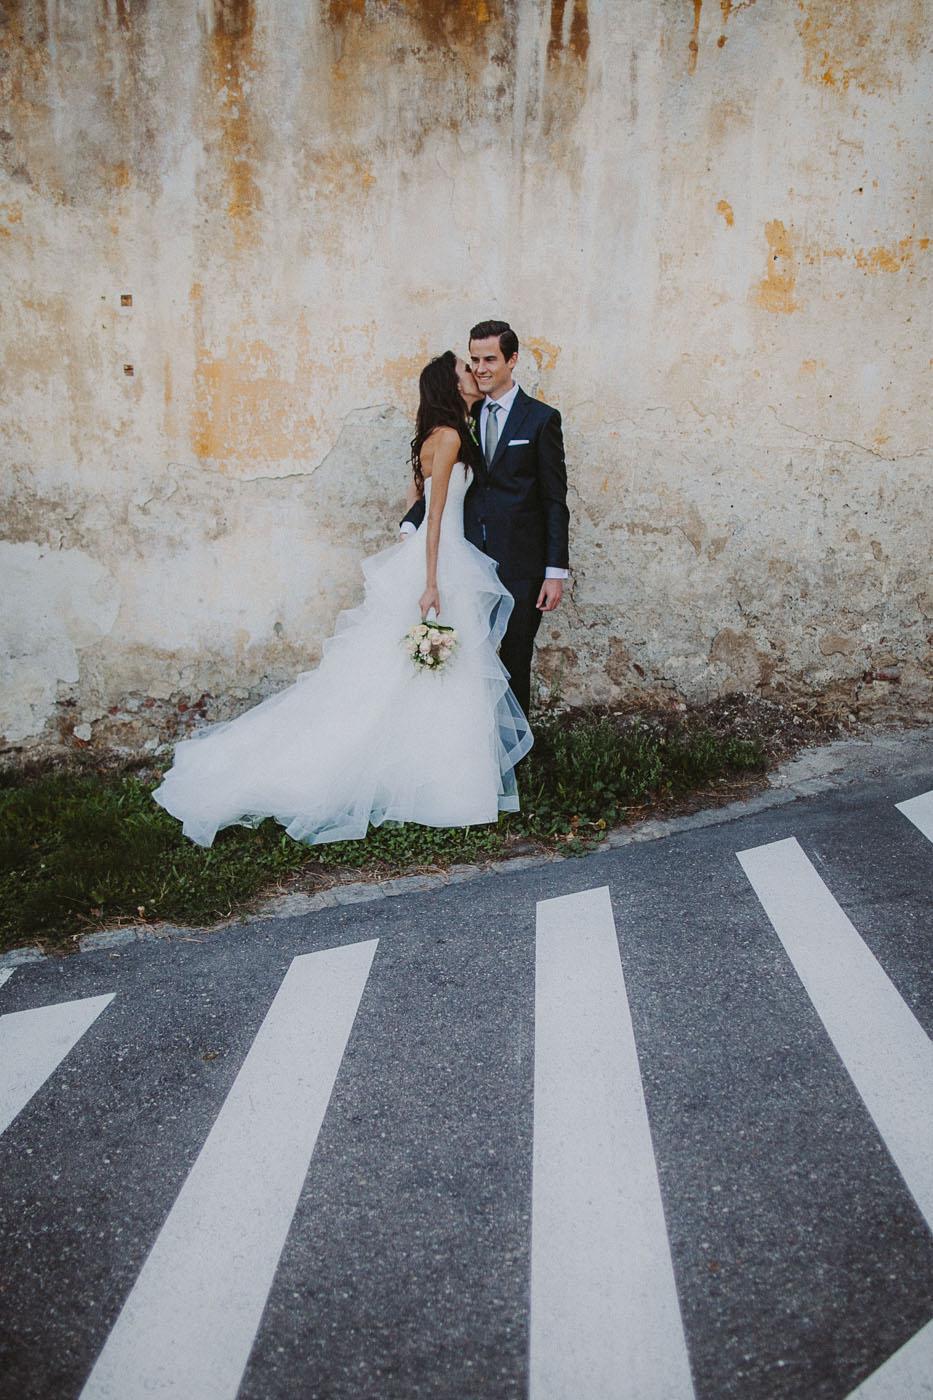 wedding-photographer-walpersdorf-austria-19